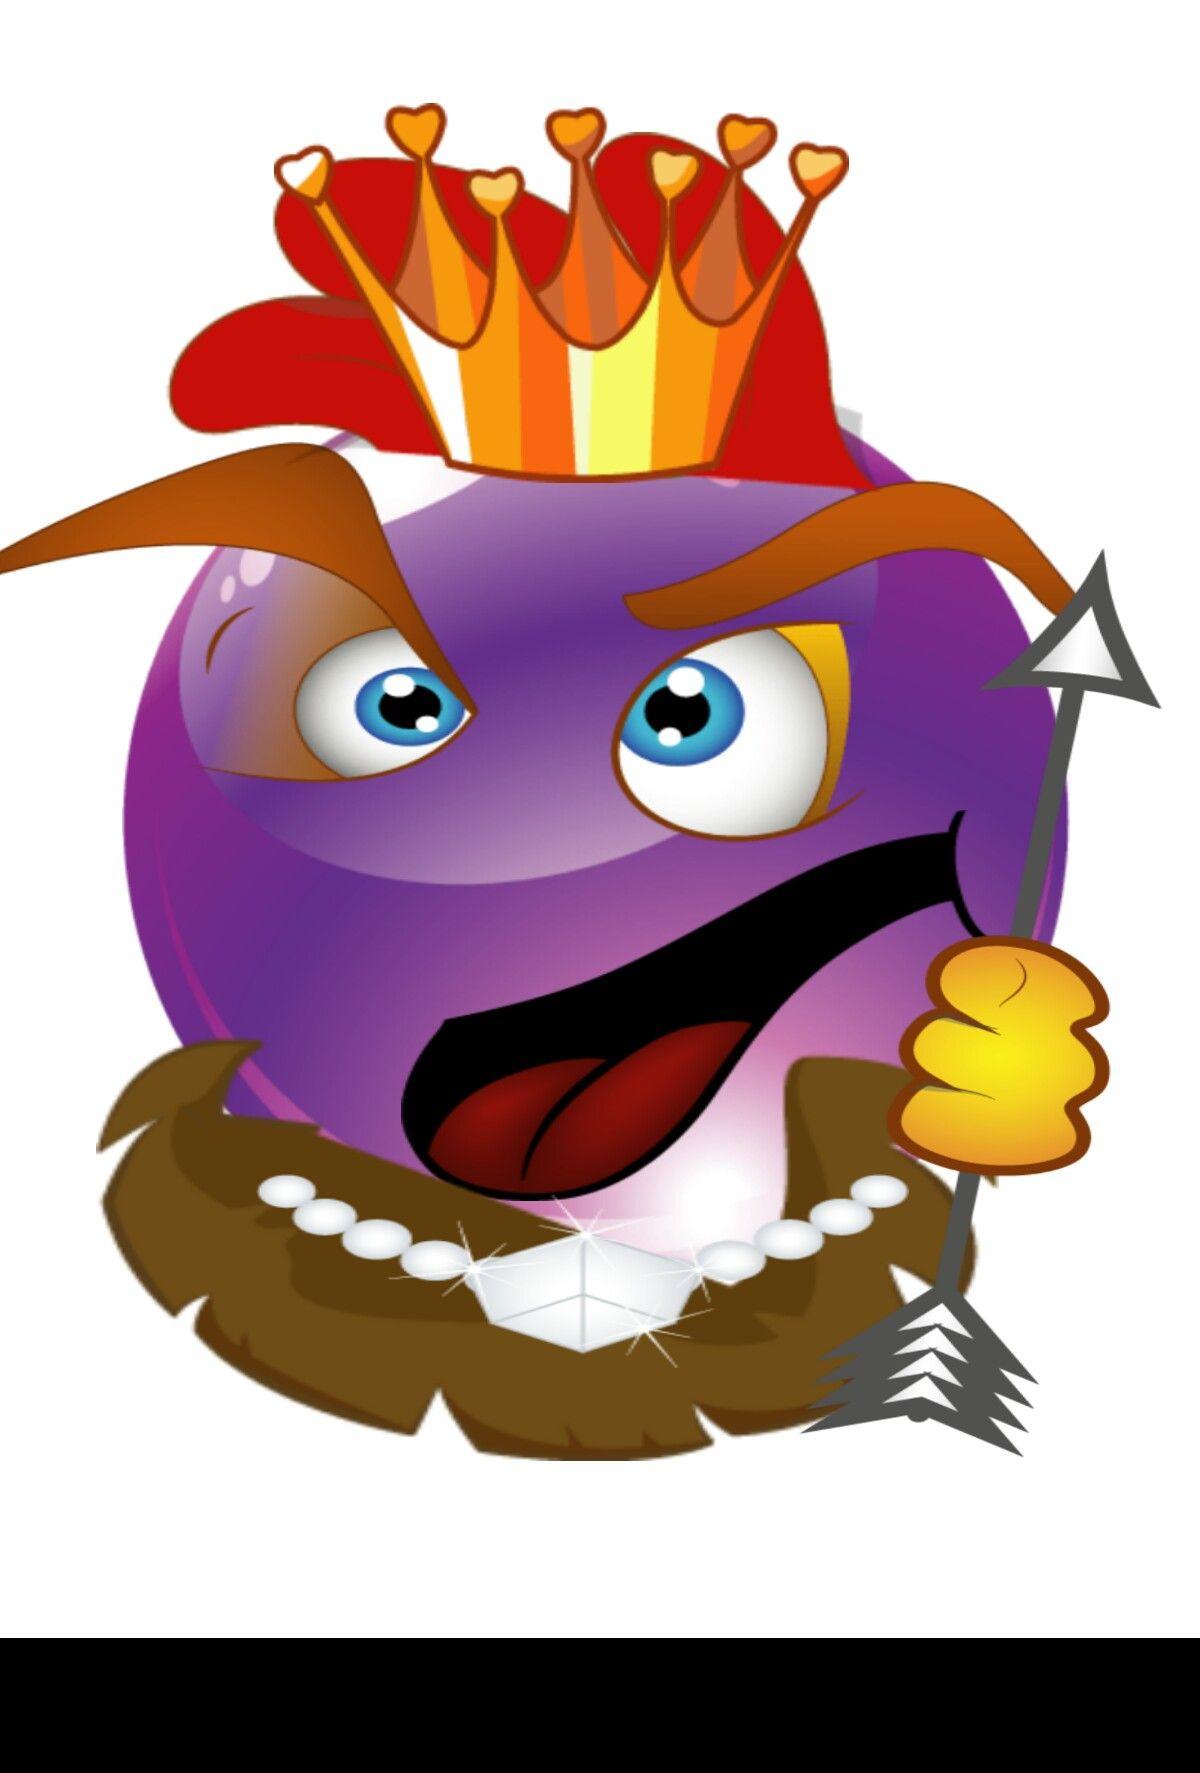 Pin by BigC😂 on Emojis Emoticon, Pink purple, Emoji